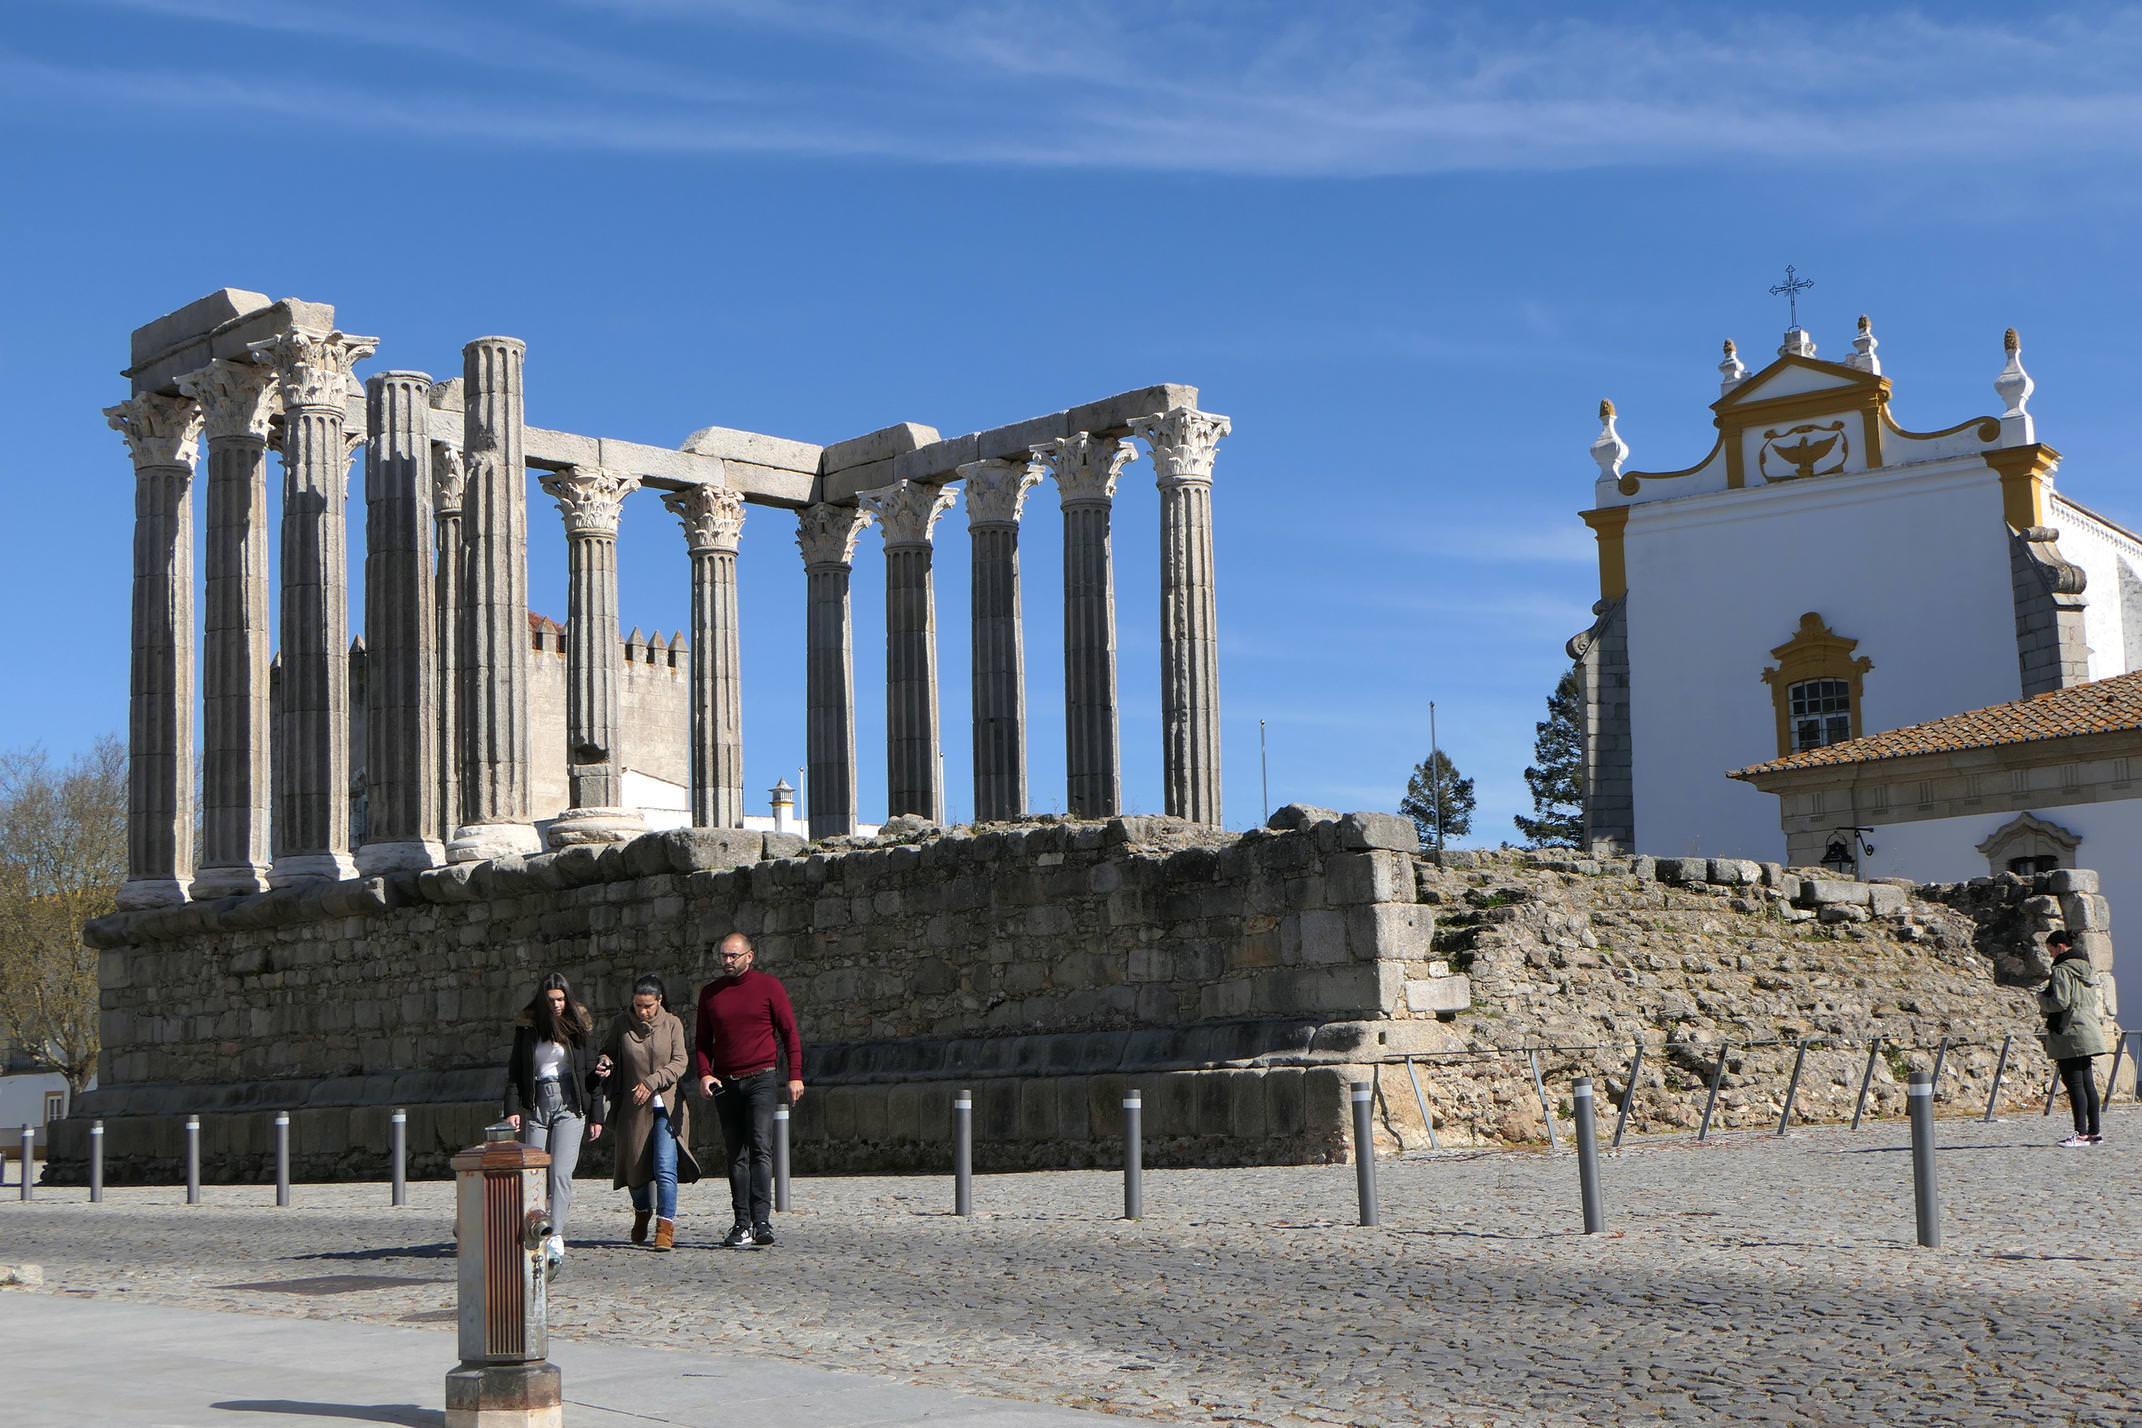 Portugal alentejo evora diana roman temple 3 c diego